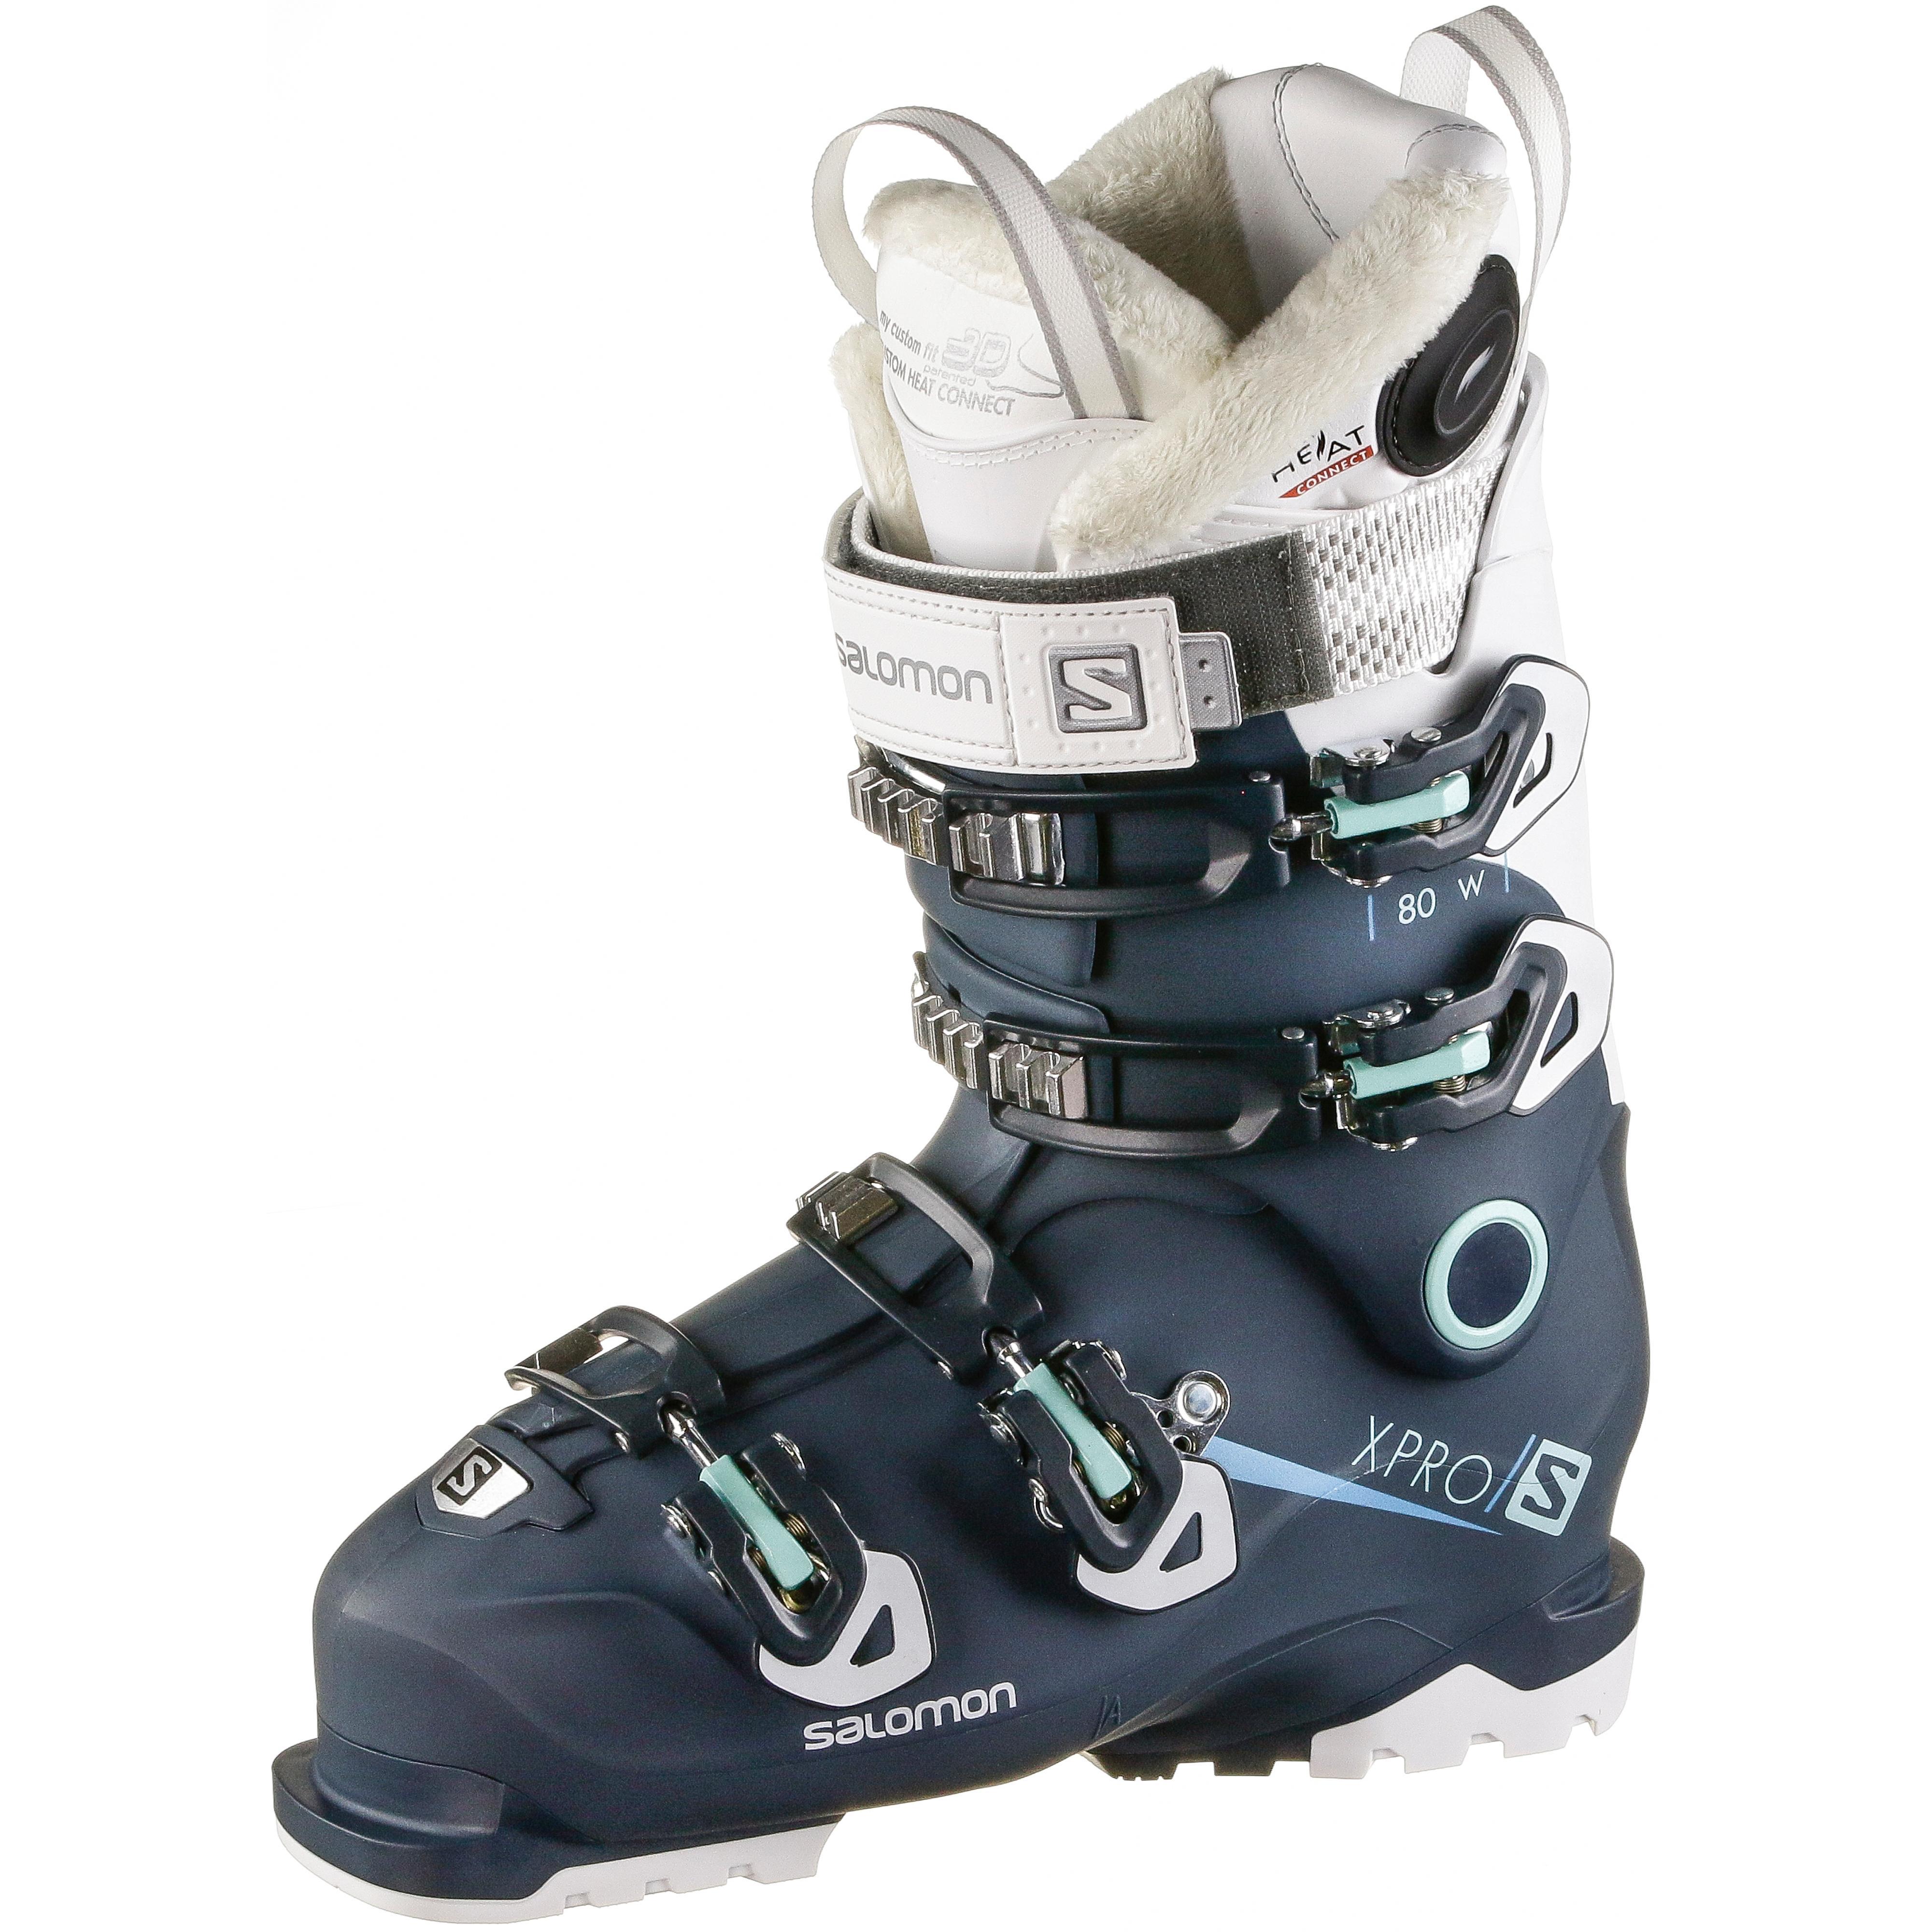 Snowboard Salomon Boa Damen L37568200 Boot Scarlet Softboot zLqSMUpGV